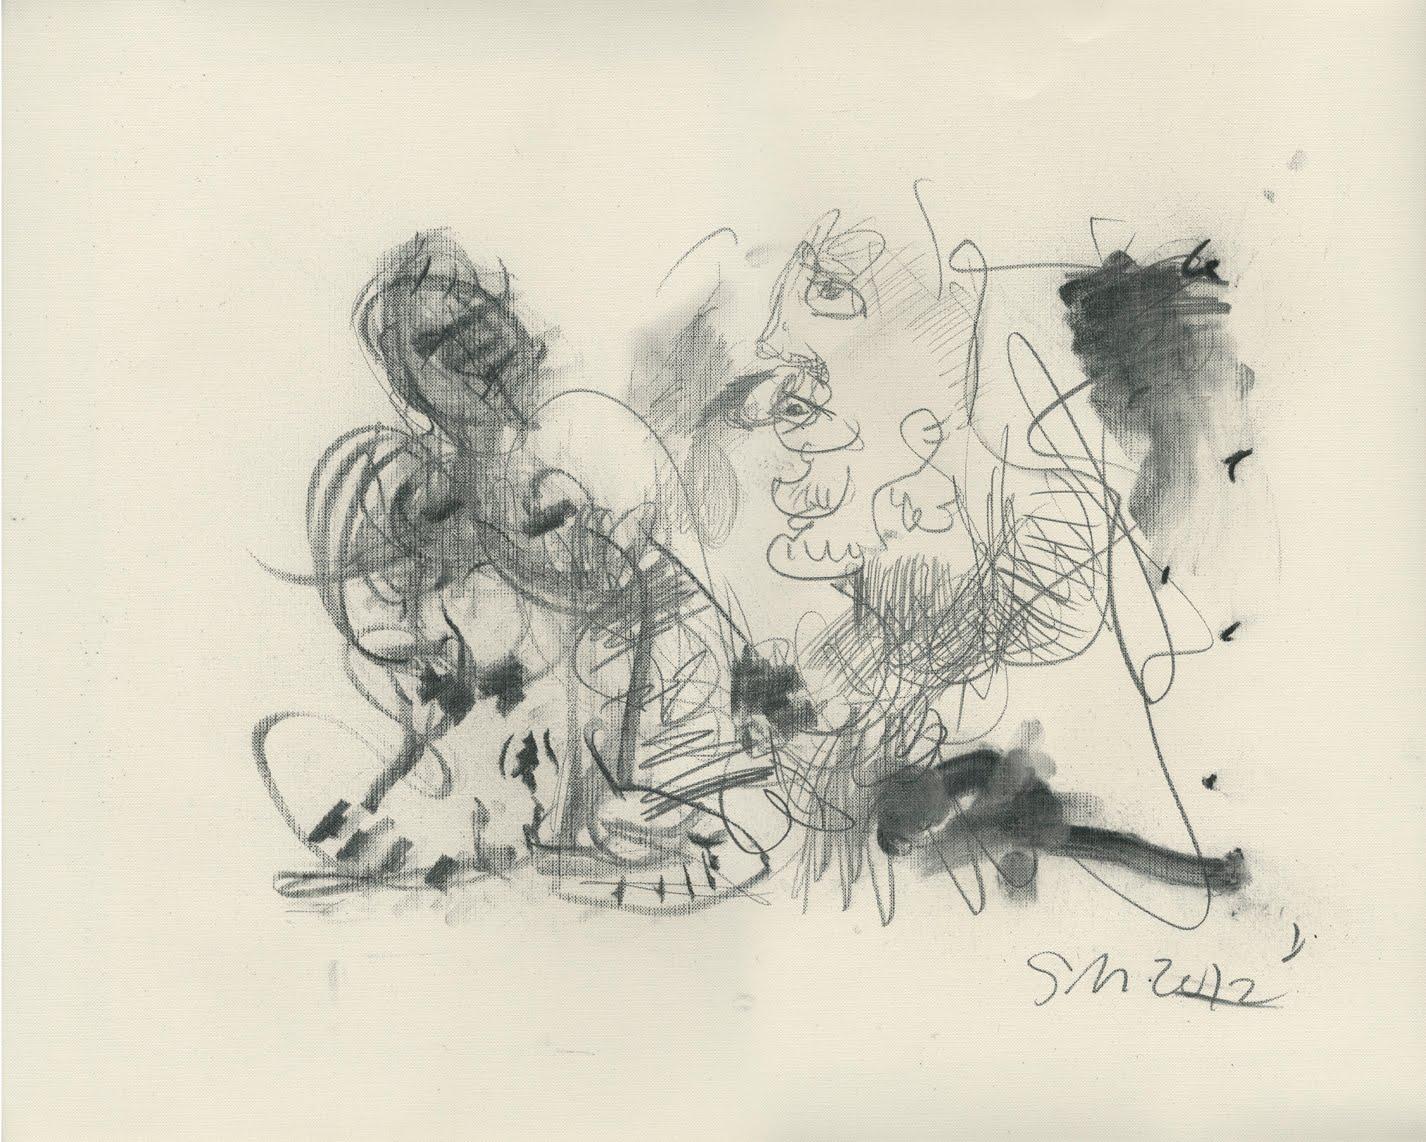 http://3.bp.blogspot.com/-B34-tbEXDTs/Twu3i7rSWAI/AAAAAAAAAeI/WYYU45-4FoE/s1600/canvas_paper_drawing_pad2_08%2Bcopy.jpg